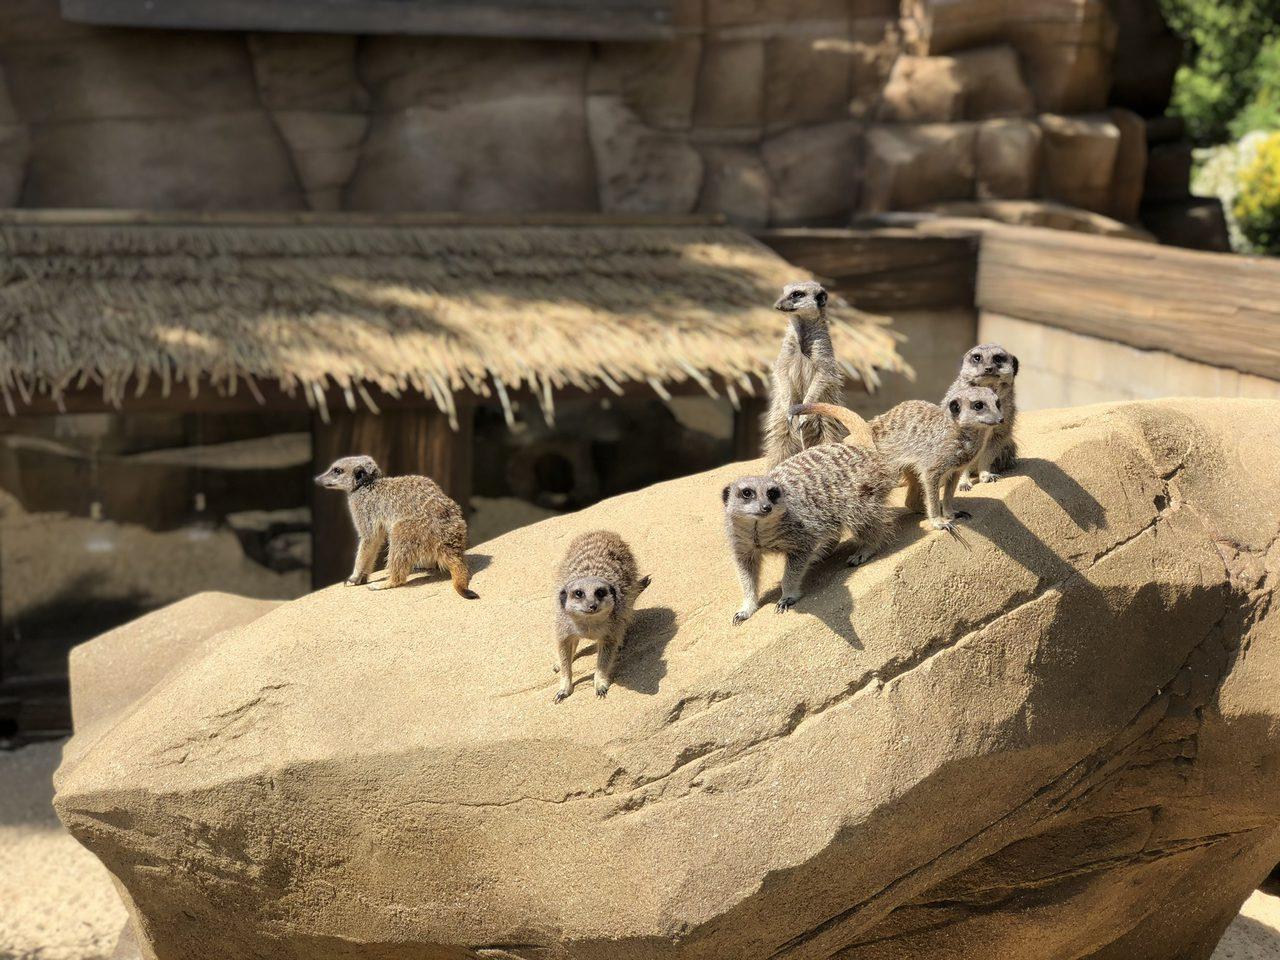 Meercat Heaven at Pettitts